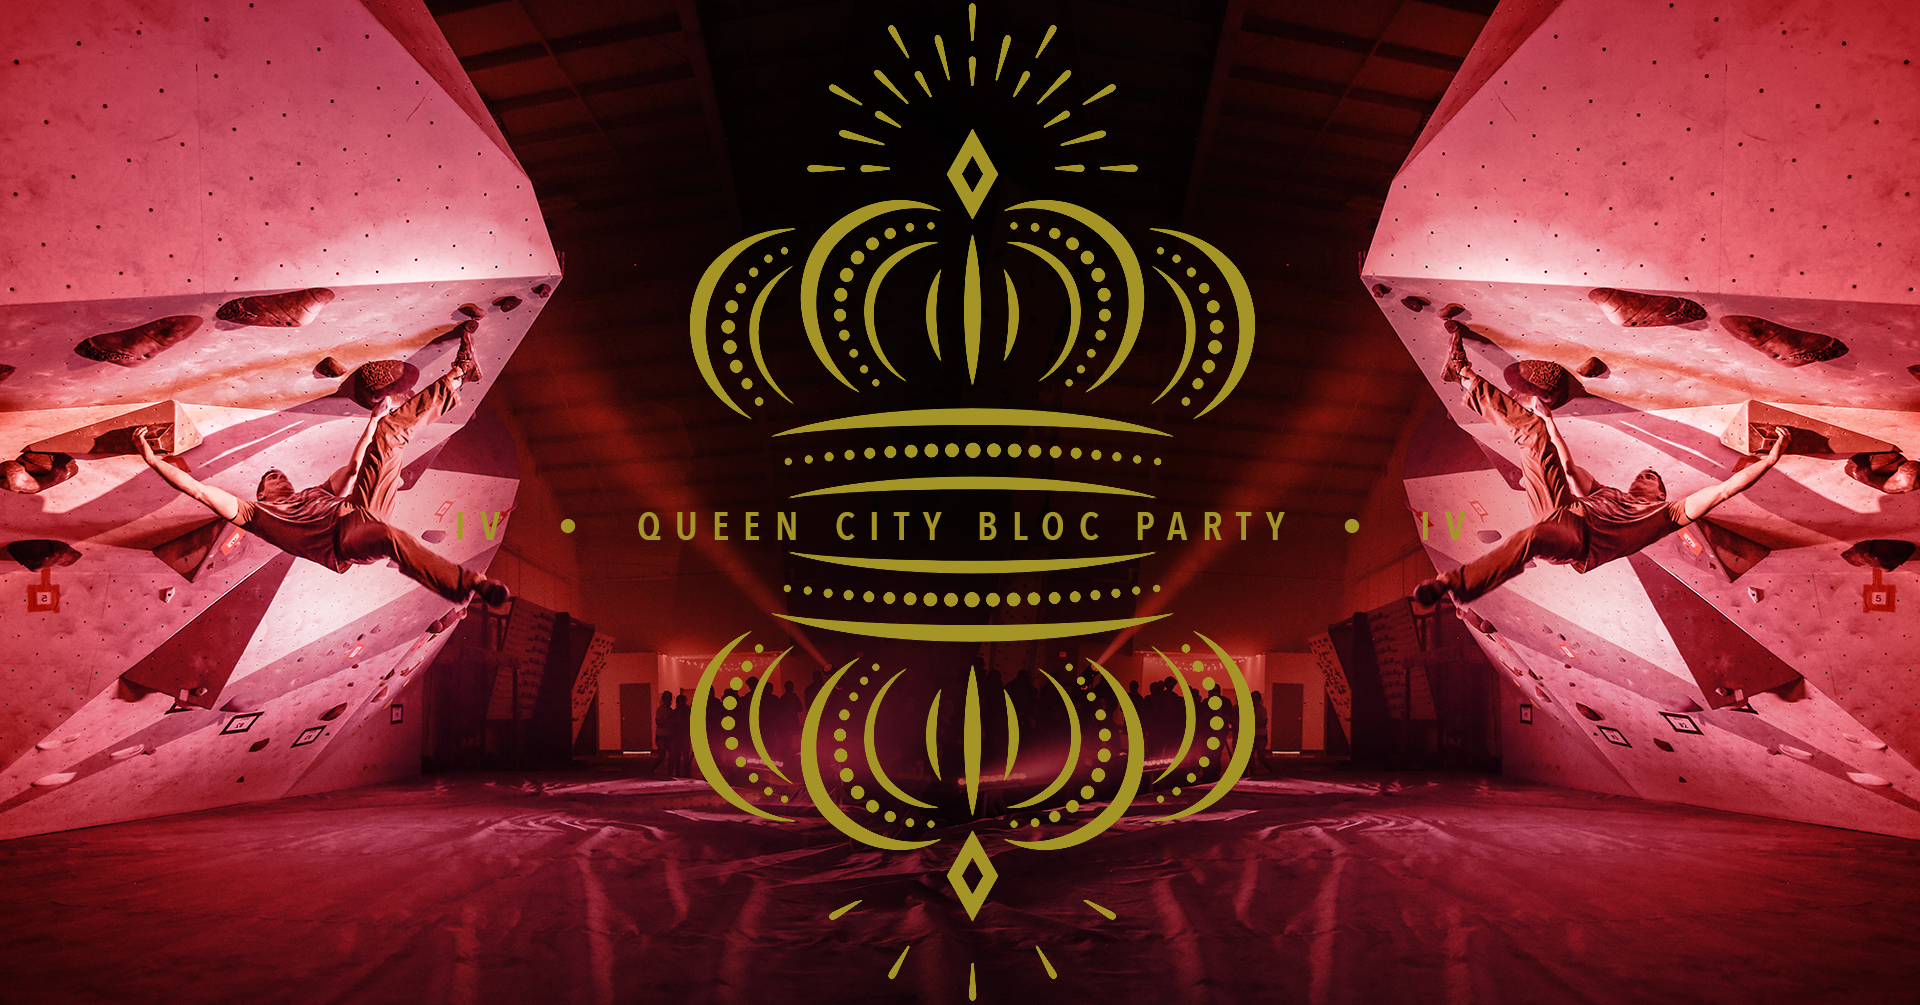 Queen City Bloc Party IV image